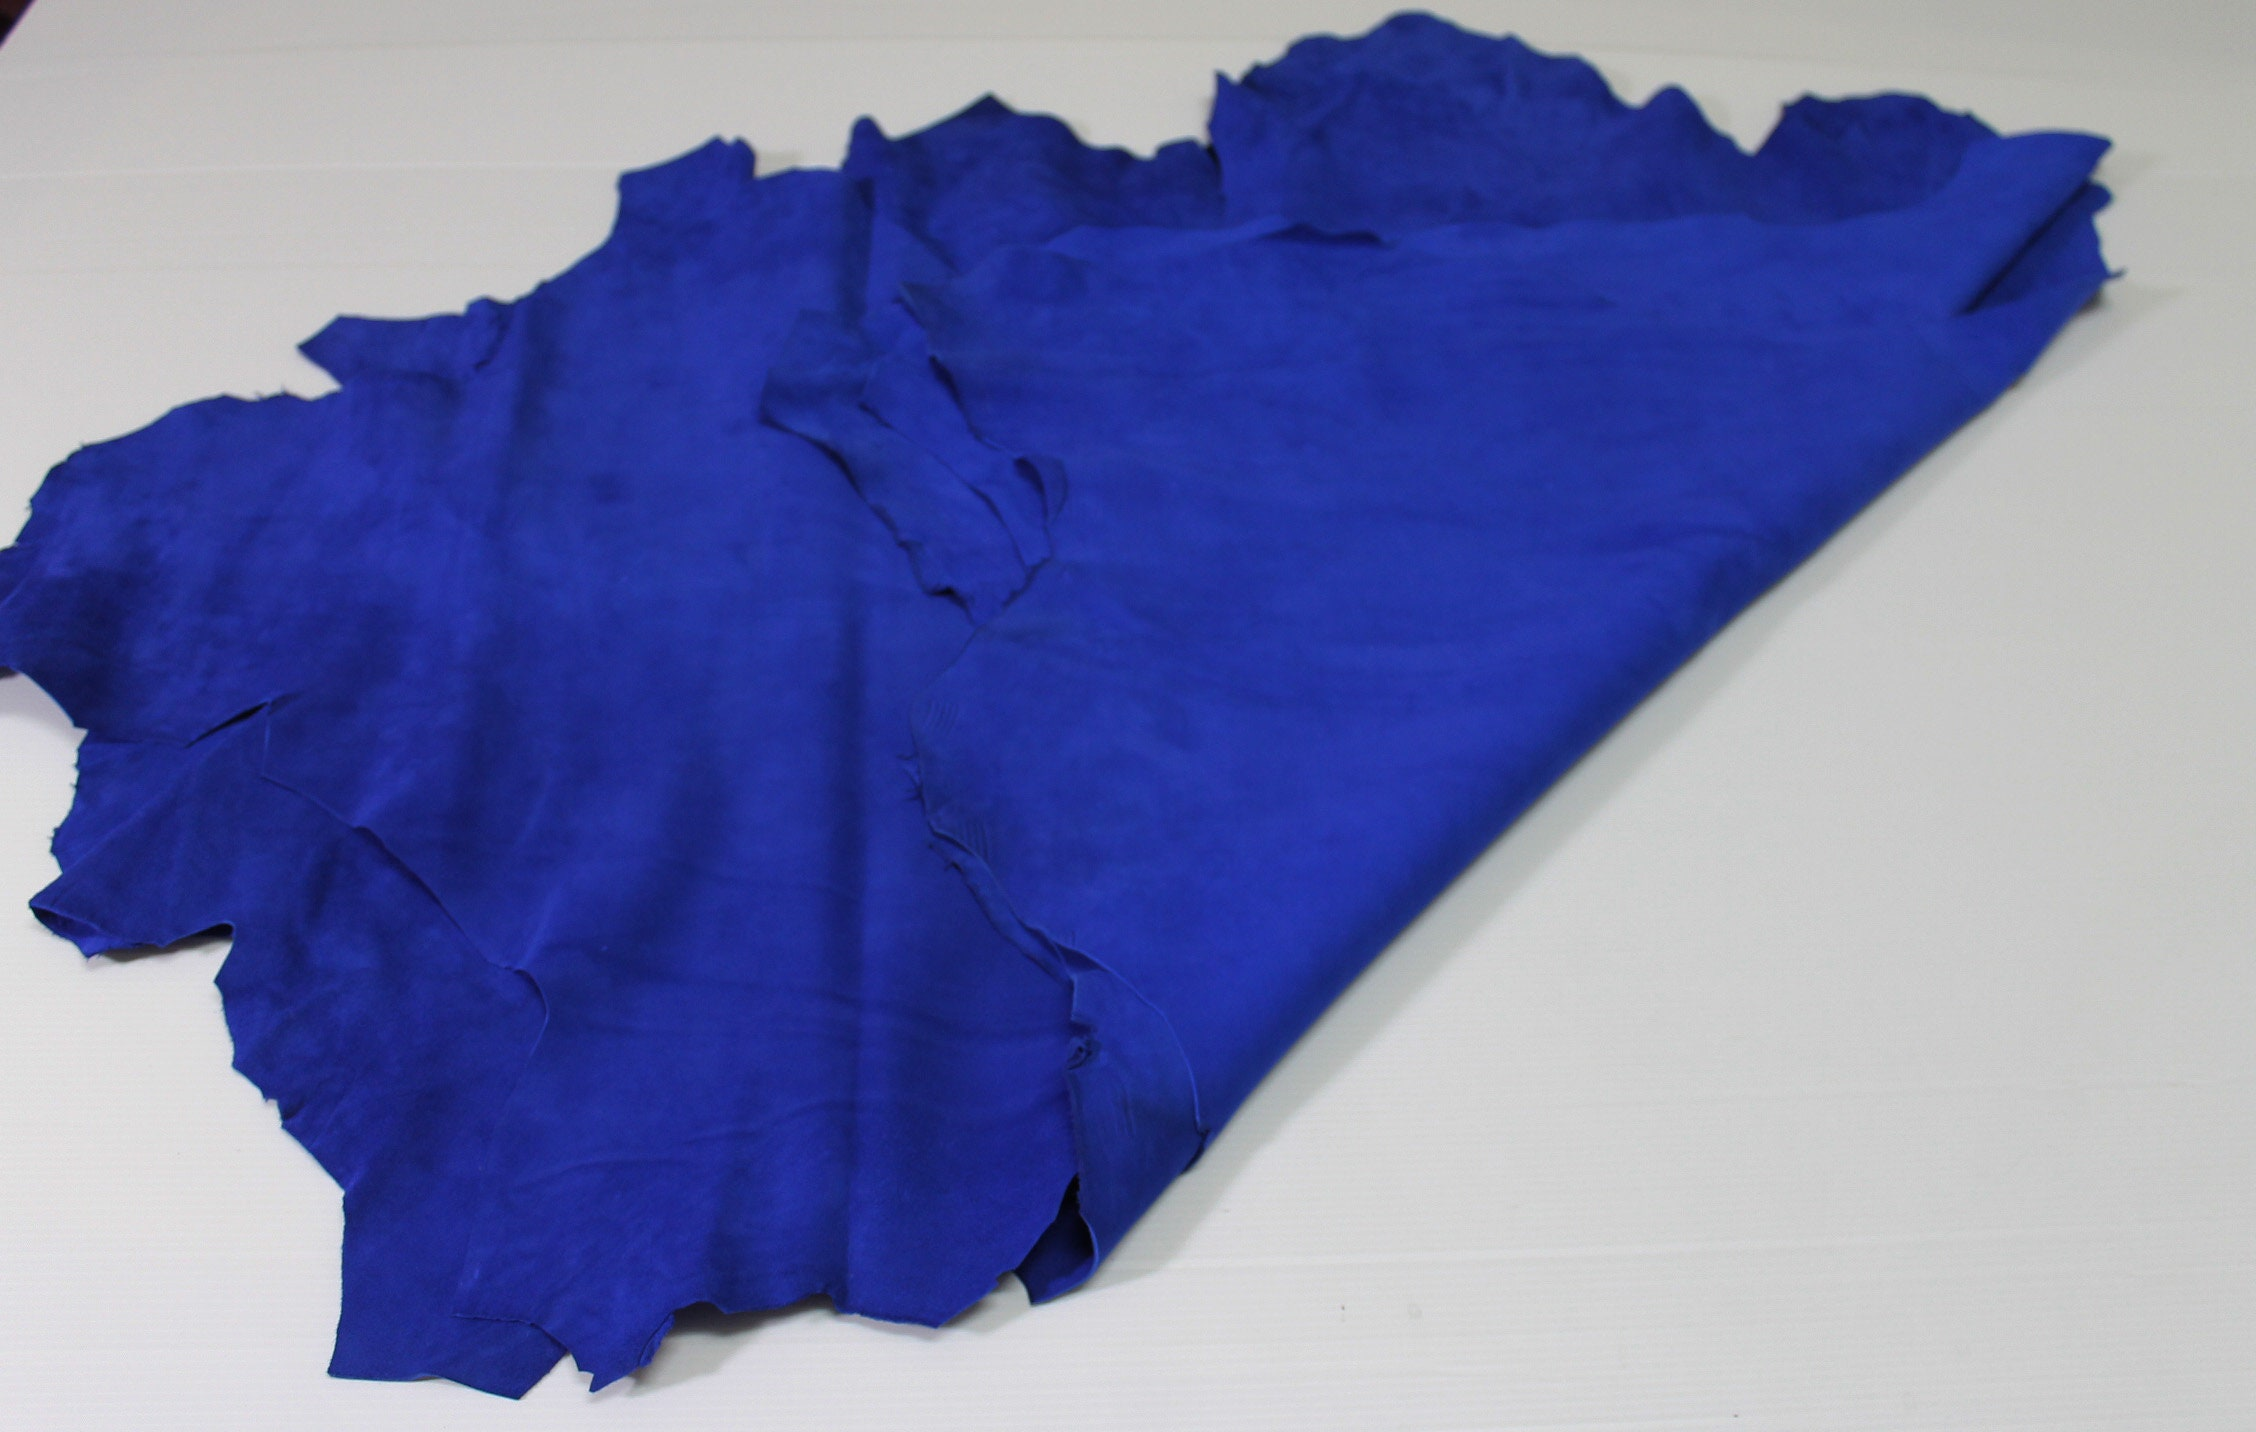 9e71833120a7 ROYAL BLUE SUEDE Italian genuine Lambskin Lamb Sheep leather skin ...